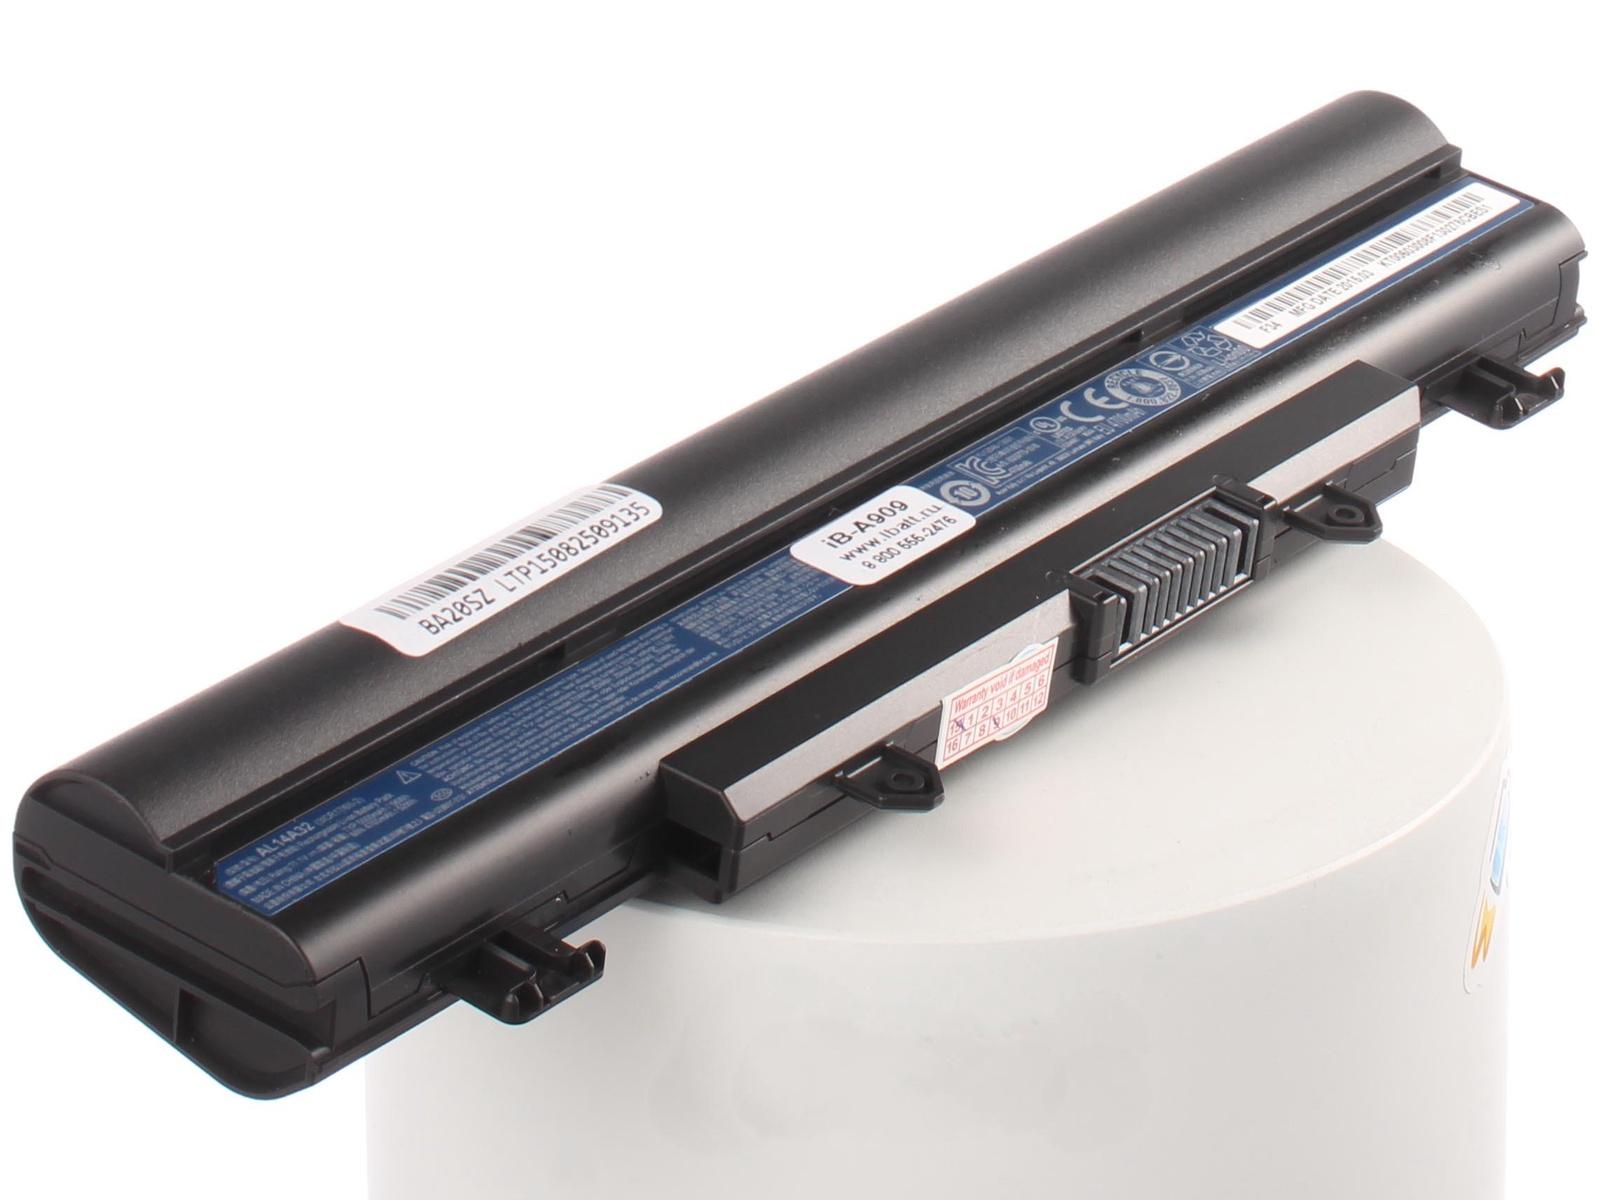 Аккумулятор для ноутбука iBatt для Acer Aspire E5-571G-39TX, ASPIRE E5-551G-T16Y, ASPIRE E5-511-C5AU, Aspire E5-511G-P26J, ASPIRE E5-511G-P78B, Aspire V3-572G-50SQ, ASPIRE E5-511-P8G3, Aspire E5-521-83RU, Aspire E5-571G 39GB ноутбук acer aspire e5 551g f63g nx mleer 010 nx mleer 010